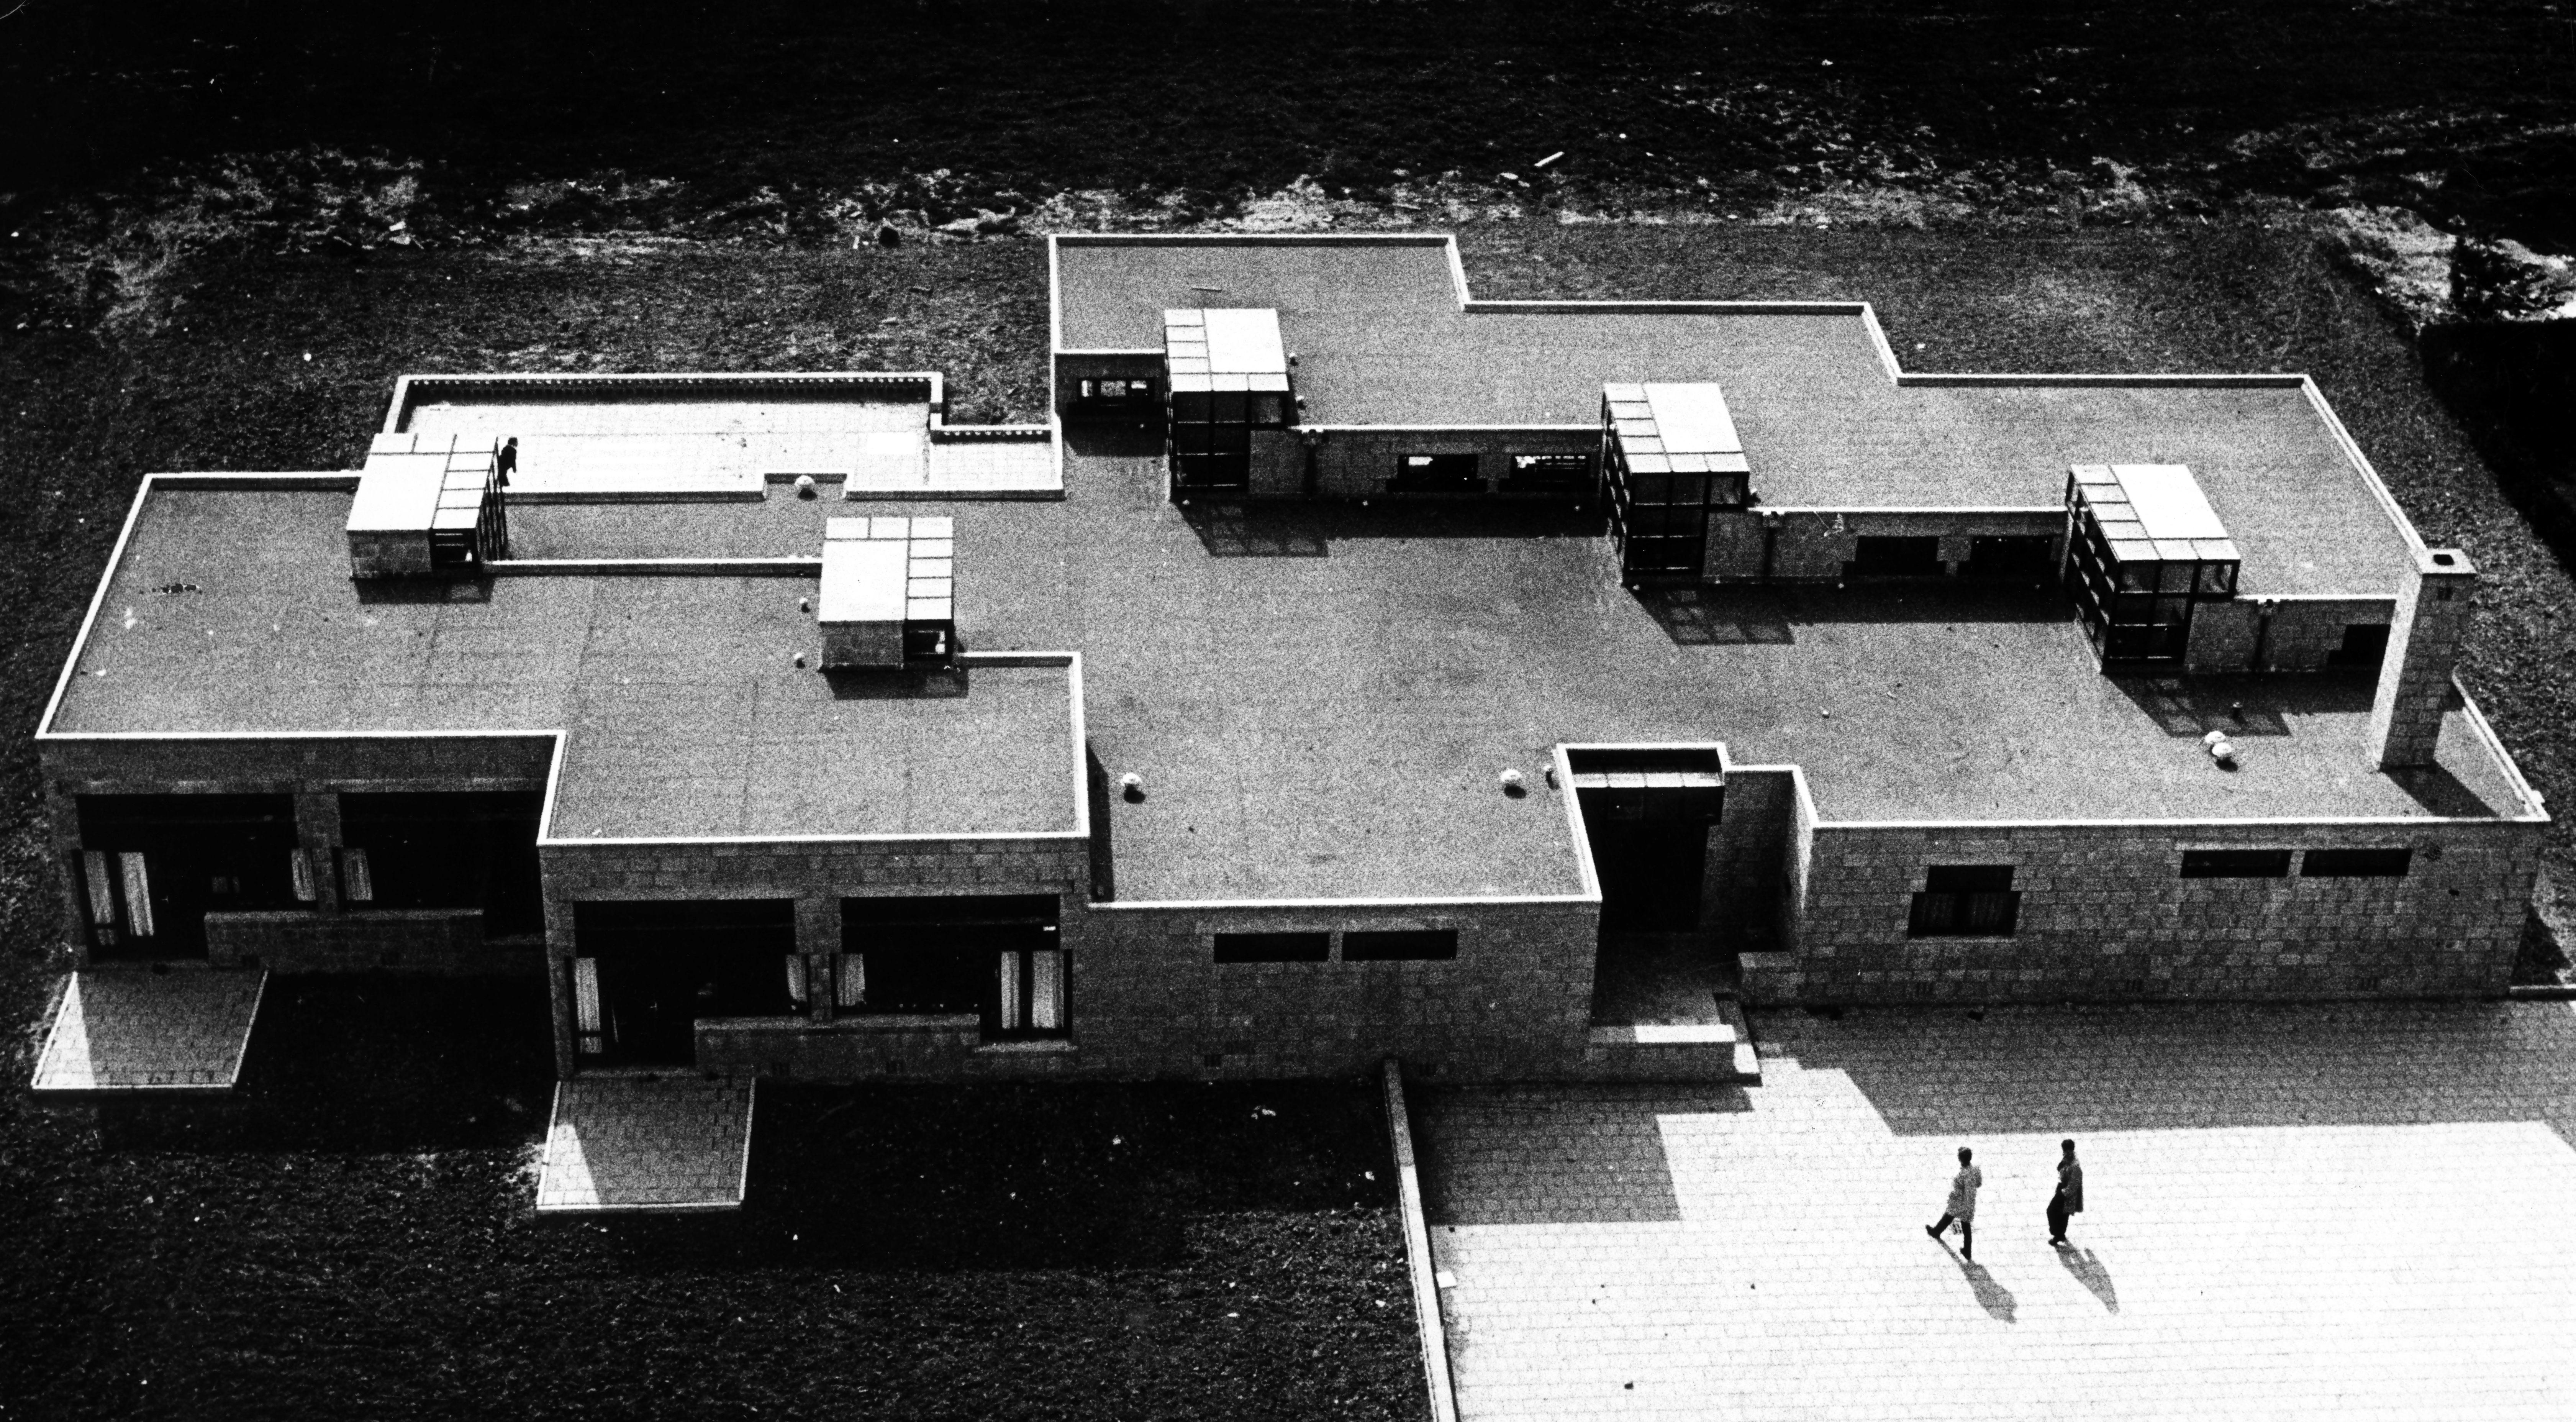 Back to school design background with primary subject matter school - Montessori School Delft